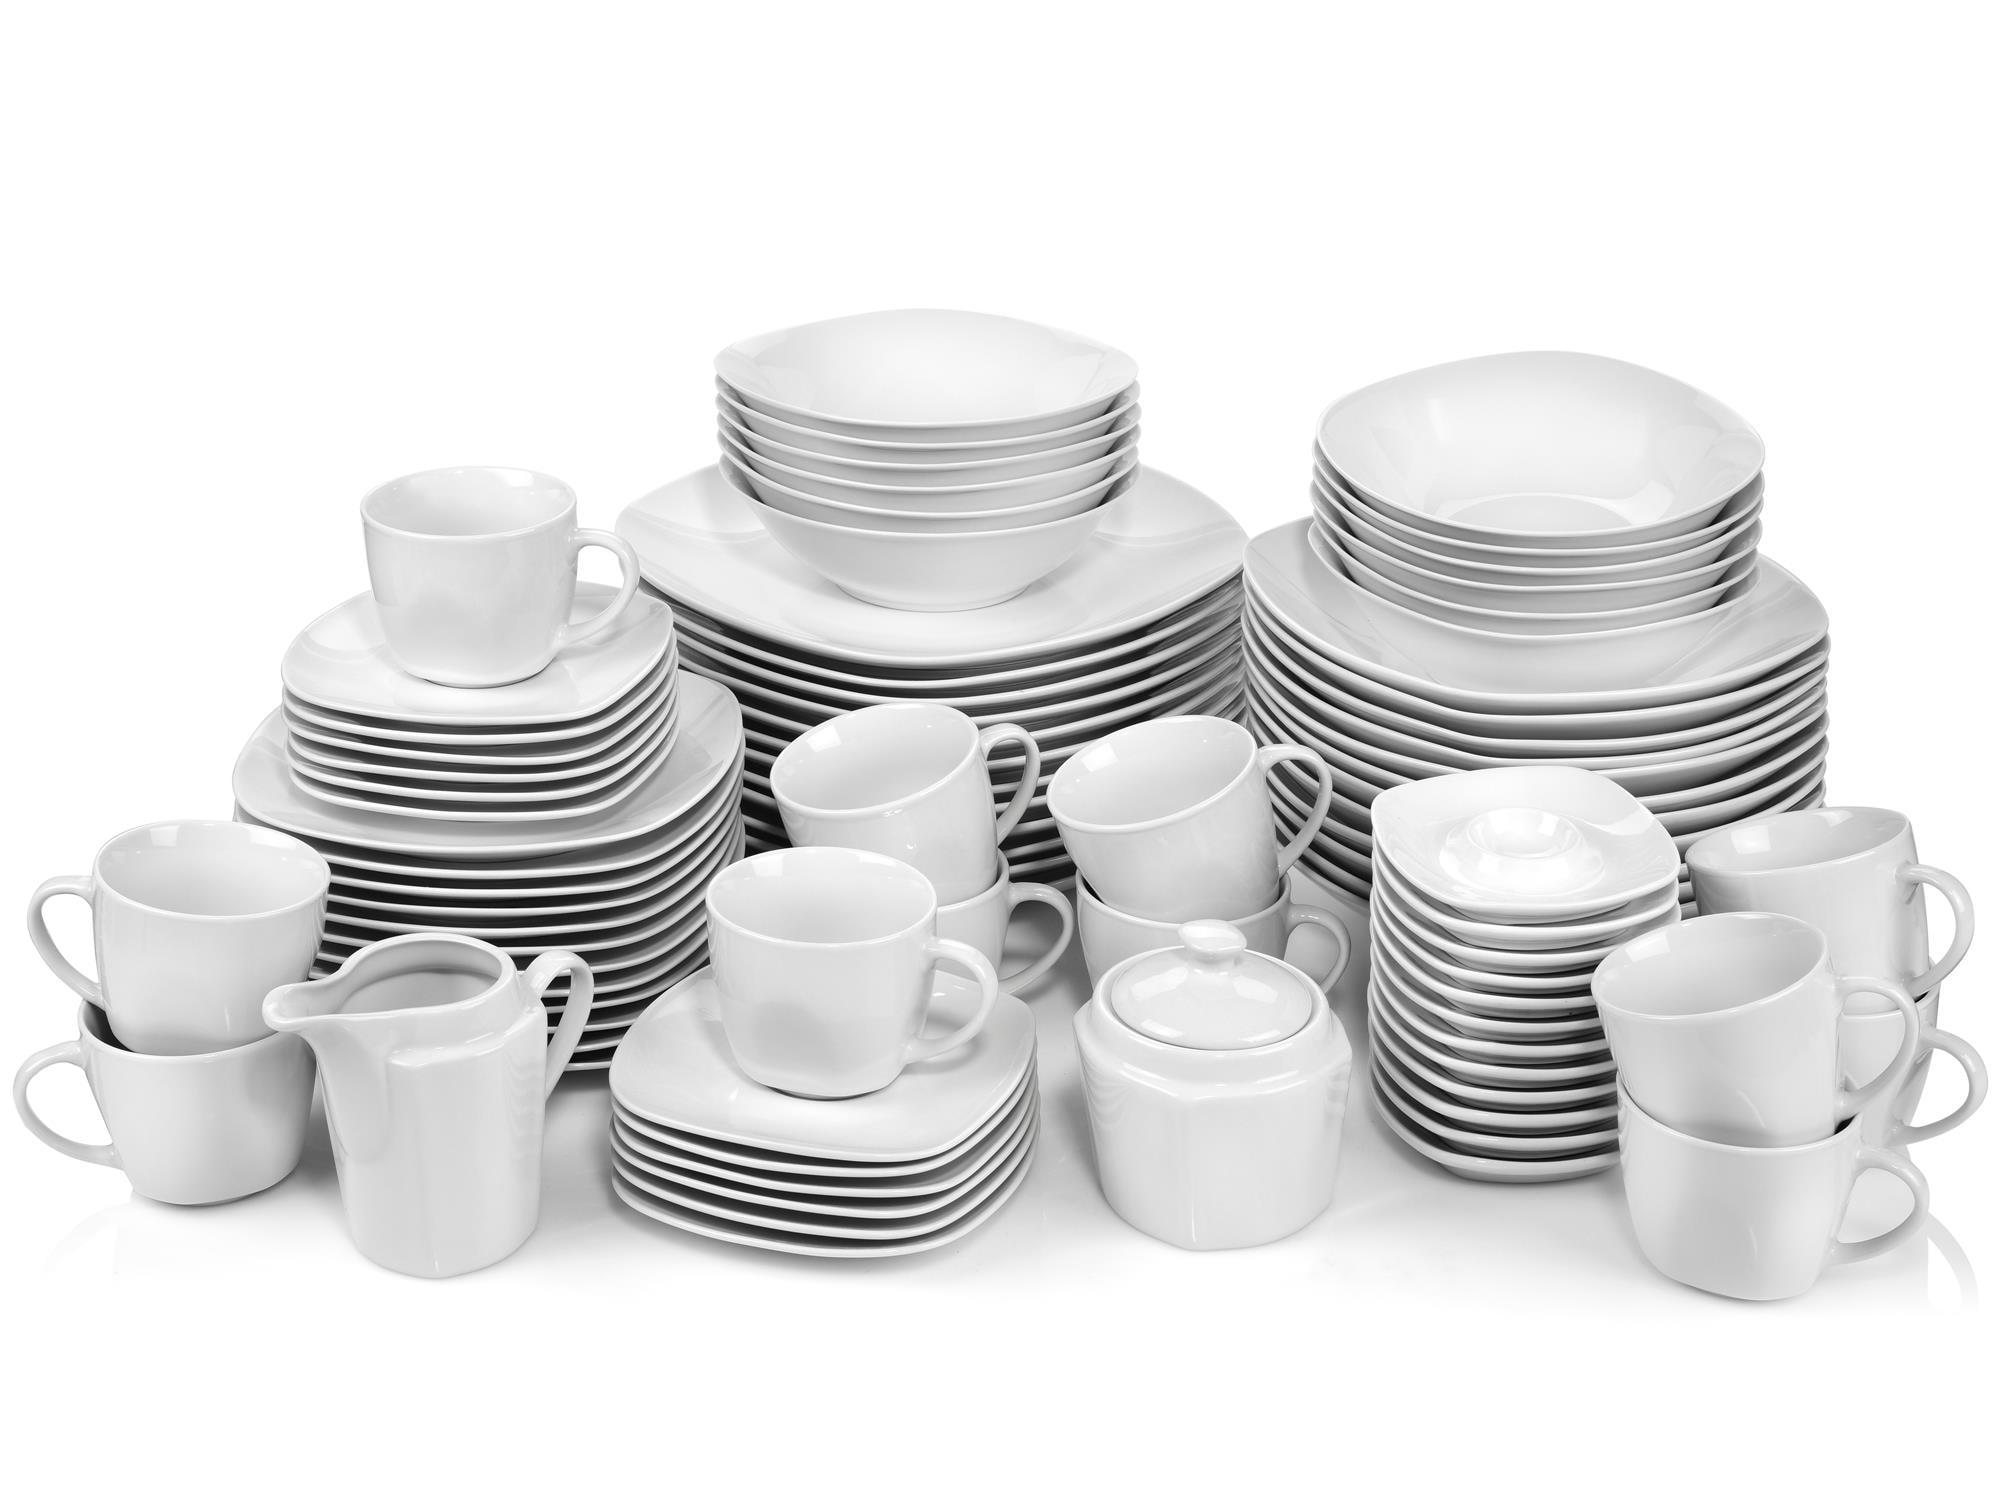 SÄNGER Kombiservice Bilgola, (86 tlg., Geschirrservice Bilgola aus Porzellan 86 teilig) weiß Geschirr-Sets Geschirr, Tischaccessoires Haushaltswaren